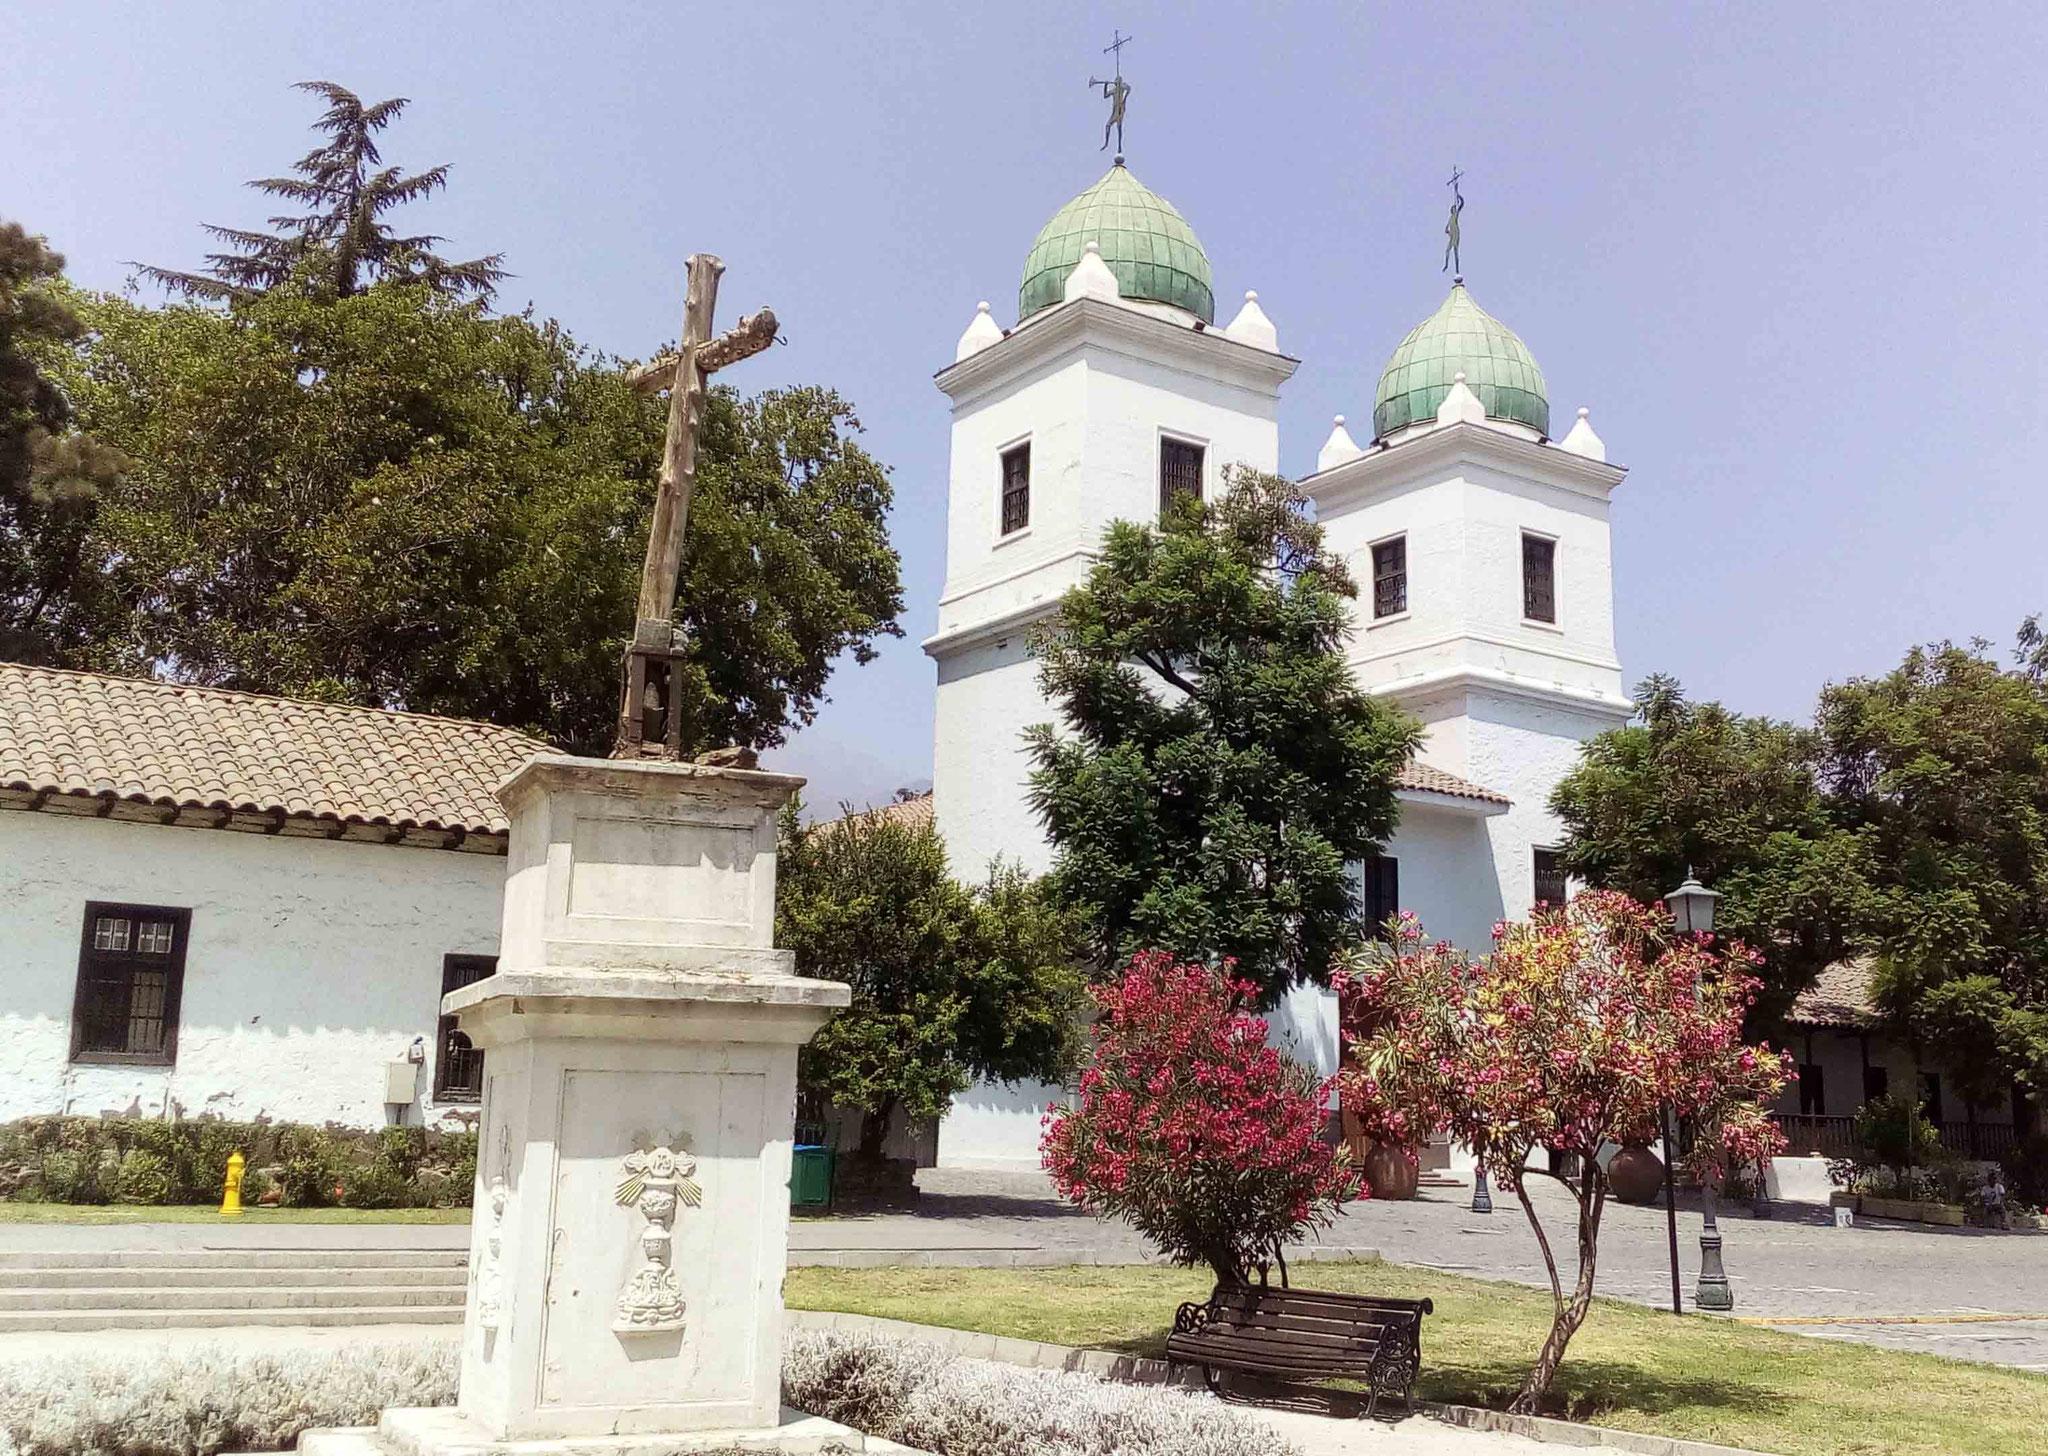 Las Condes touristique, la Iglesia Los Dominicos